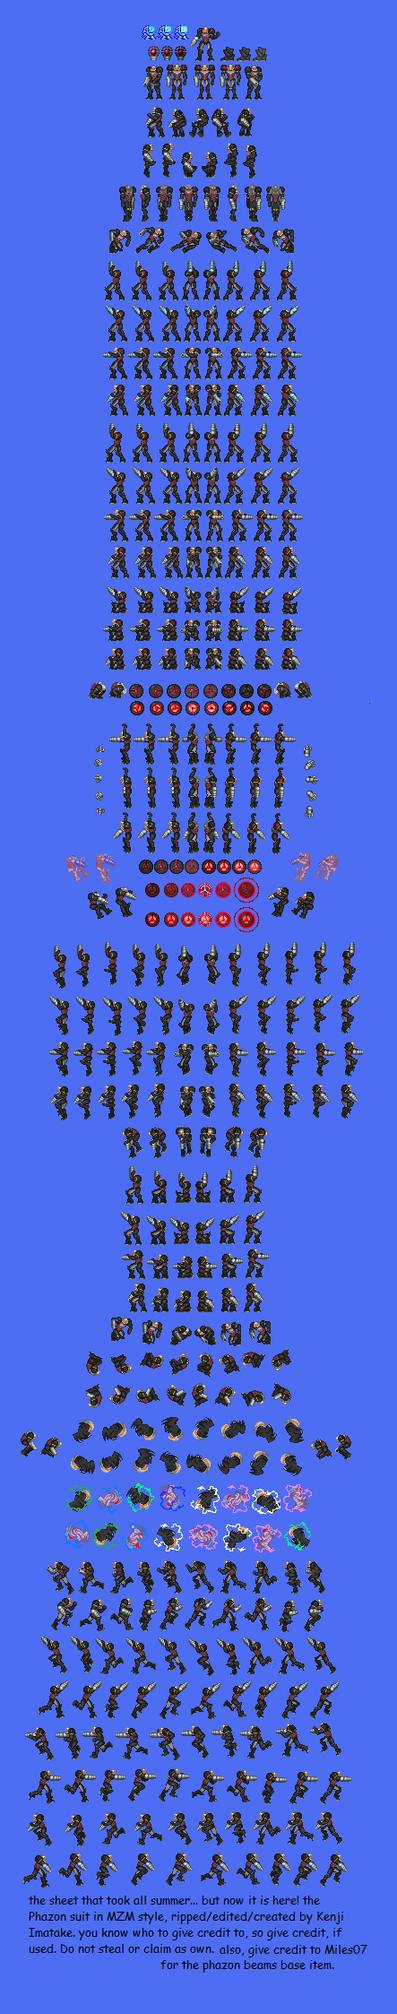 zero mission phazon suit by kenji-imatake